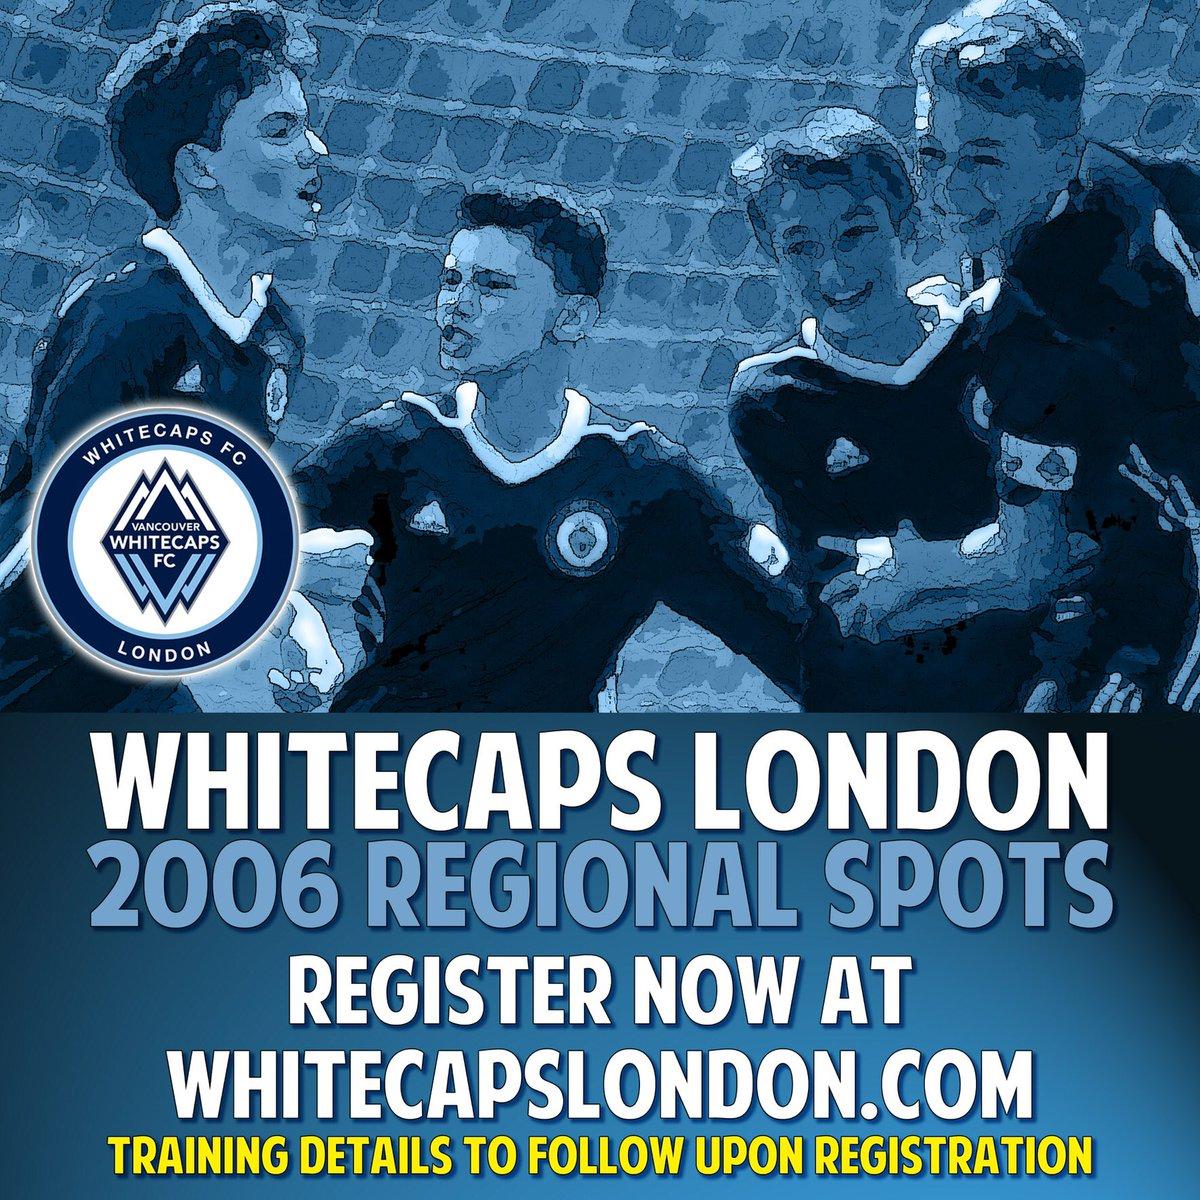 Whitecaps London - 2006 Regional Boys and Girls   ⬇️⬇️⬇️ Link for details ⬇️⬇️⬇️  http://whitecapslondon.teampages.com   #whitecapslondon #lndont @whitecapslondon #ontariosoccer #playerdevelopment